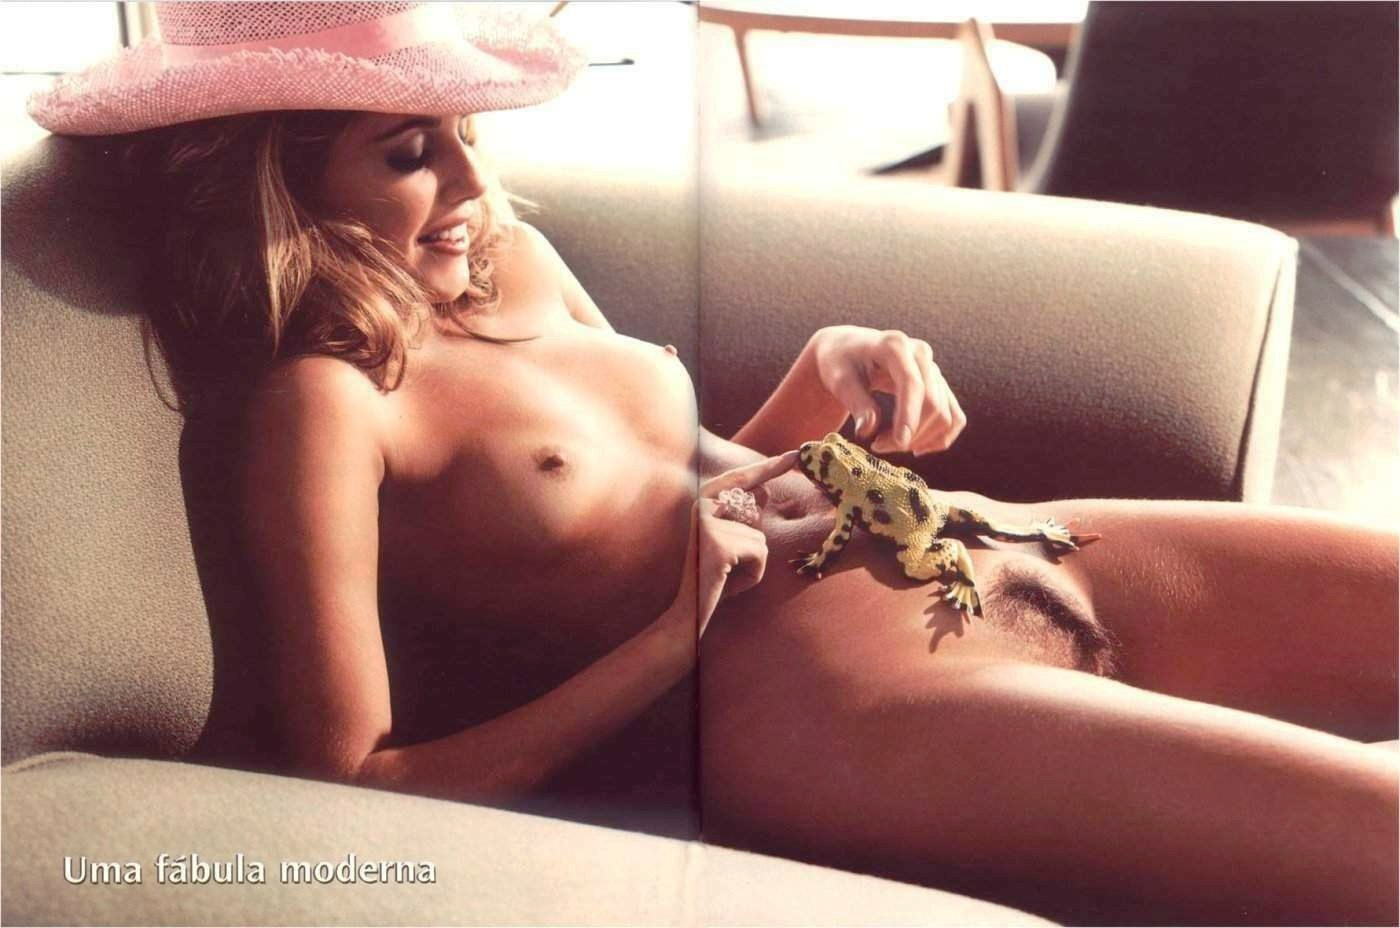 desi real life in nude